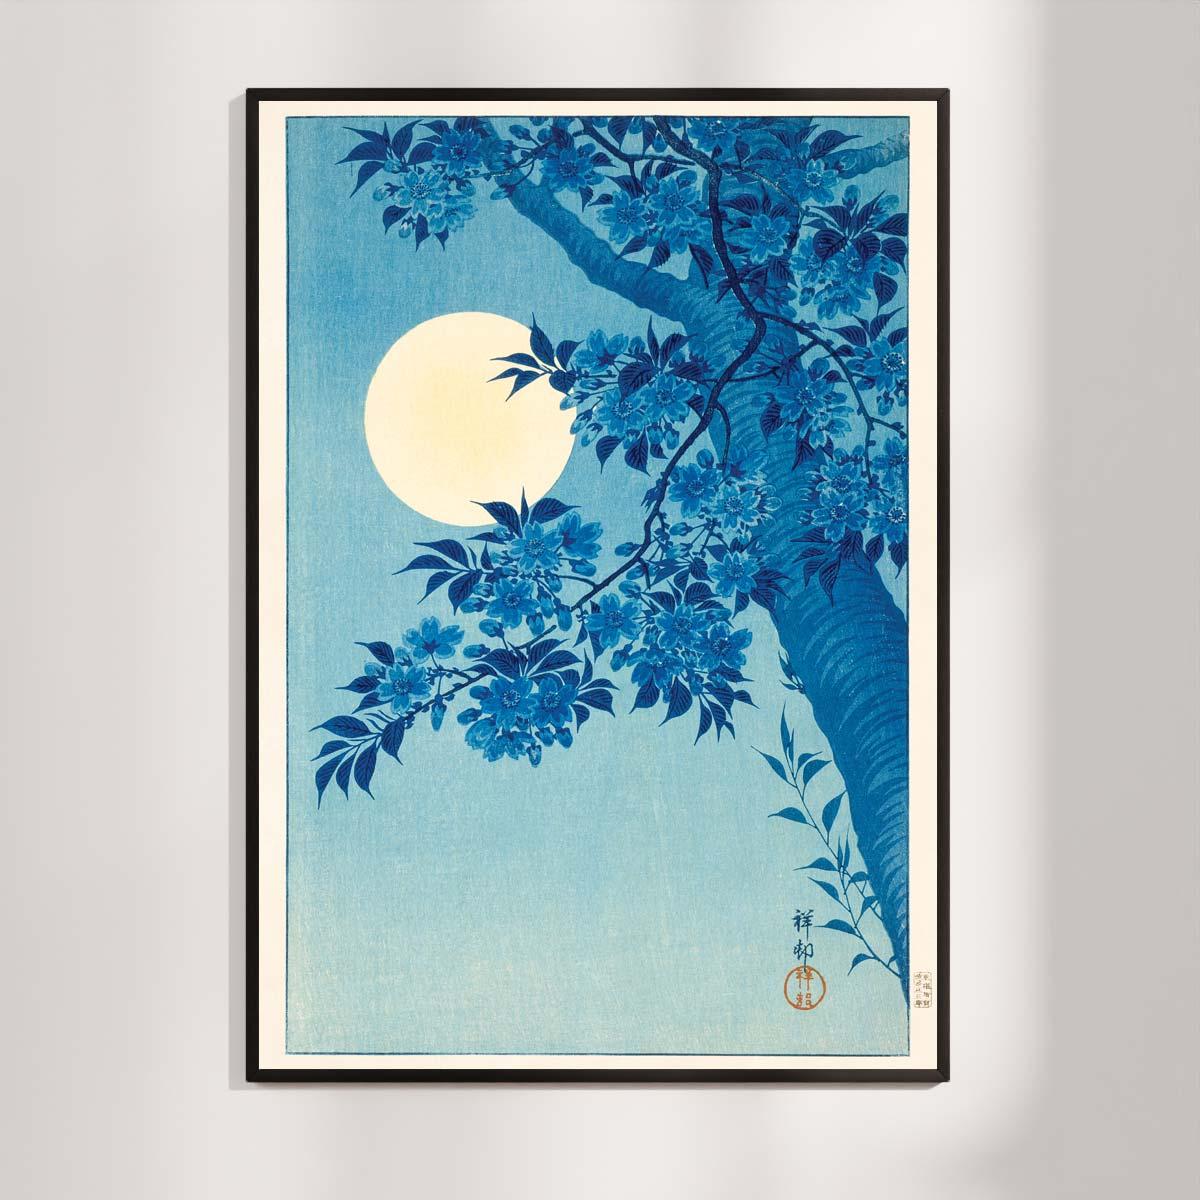 Plakat- Sakura Kirsebærblomster i måneskin - Ohara Koson træsnit 1932